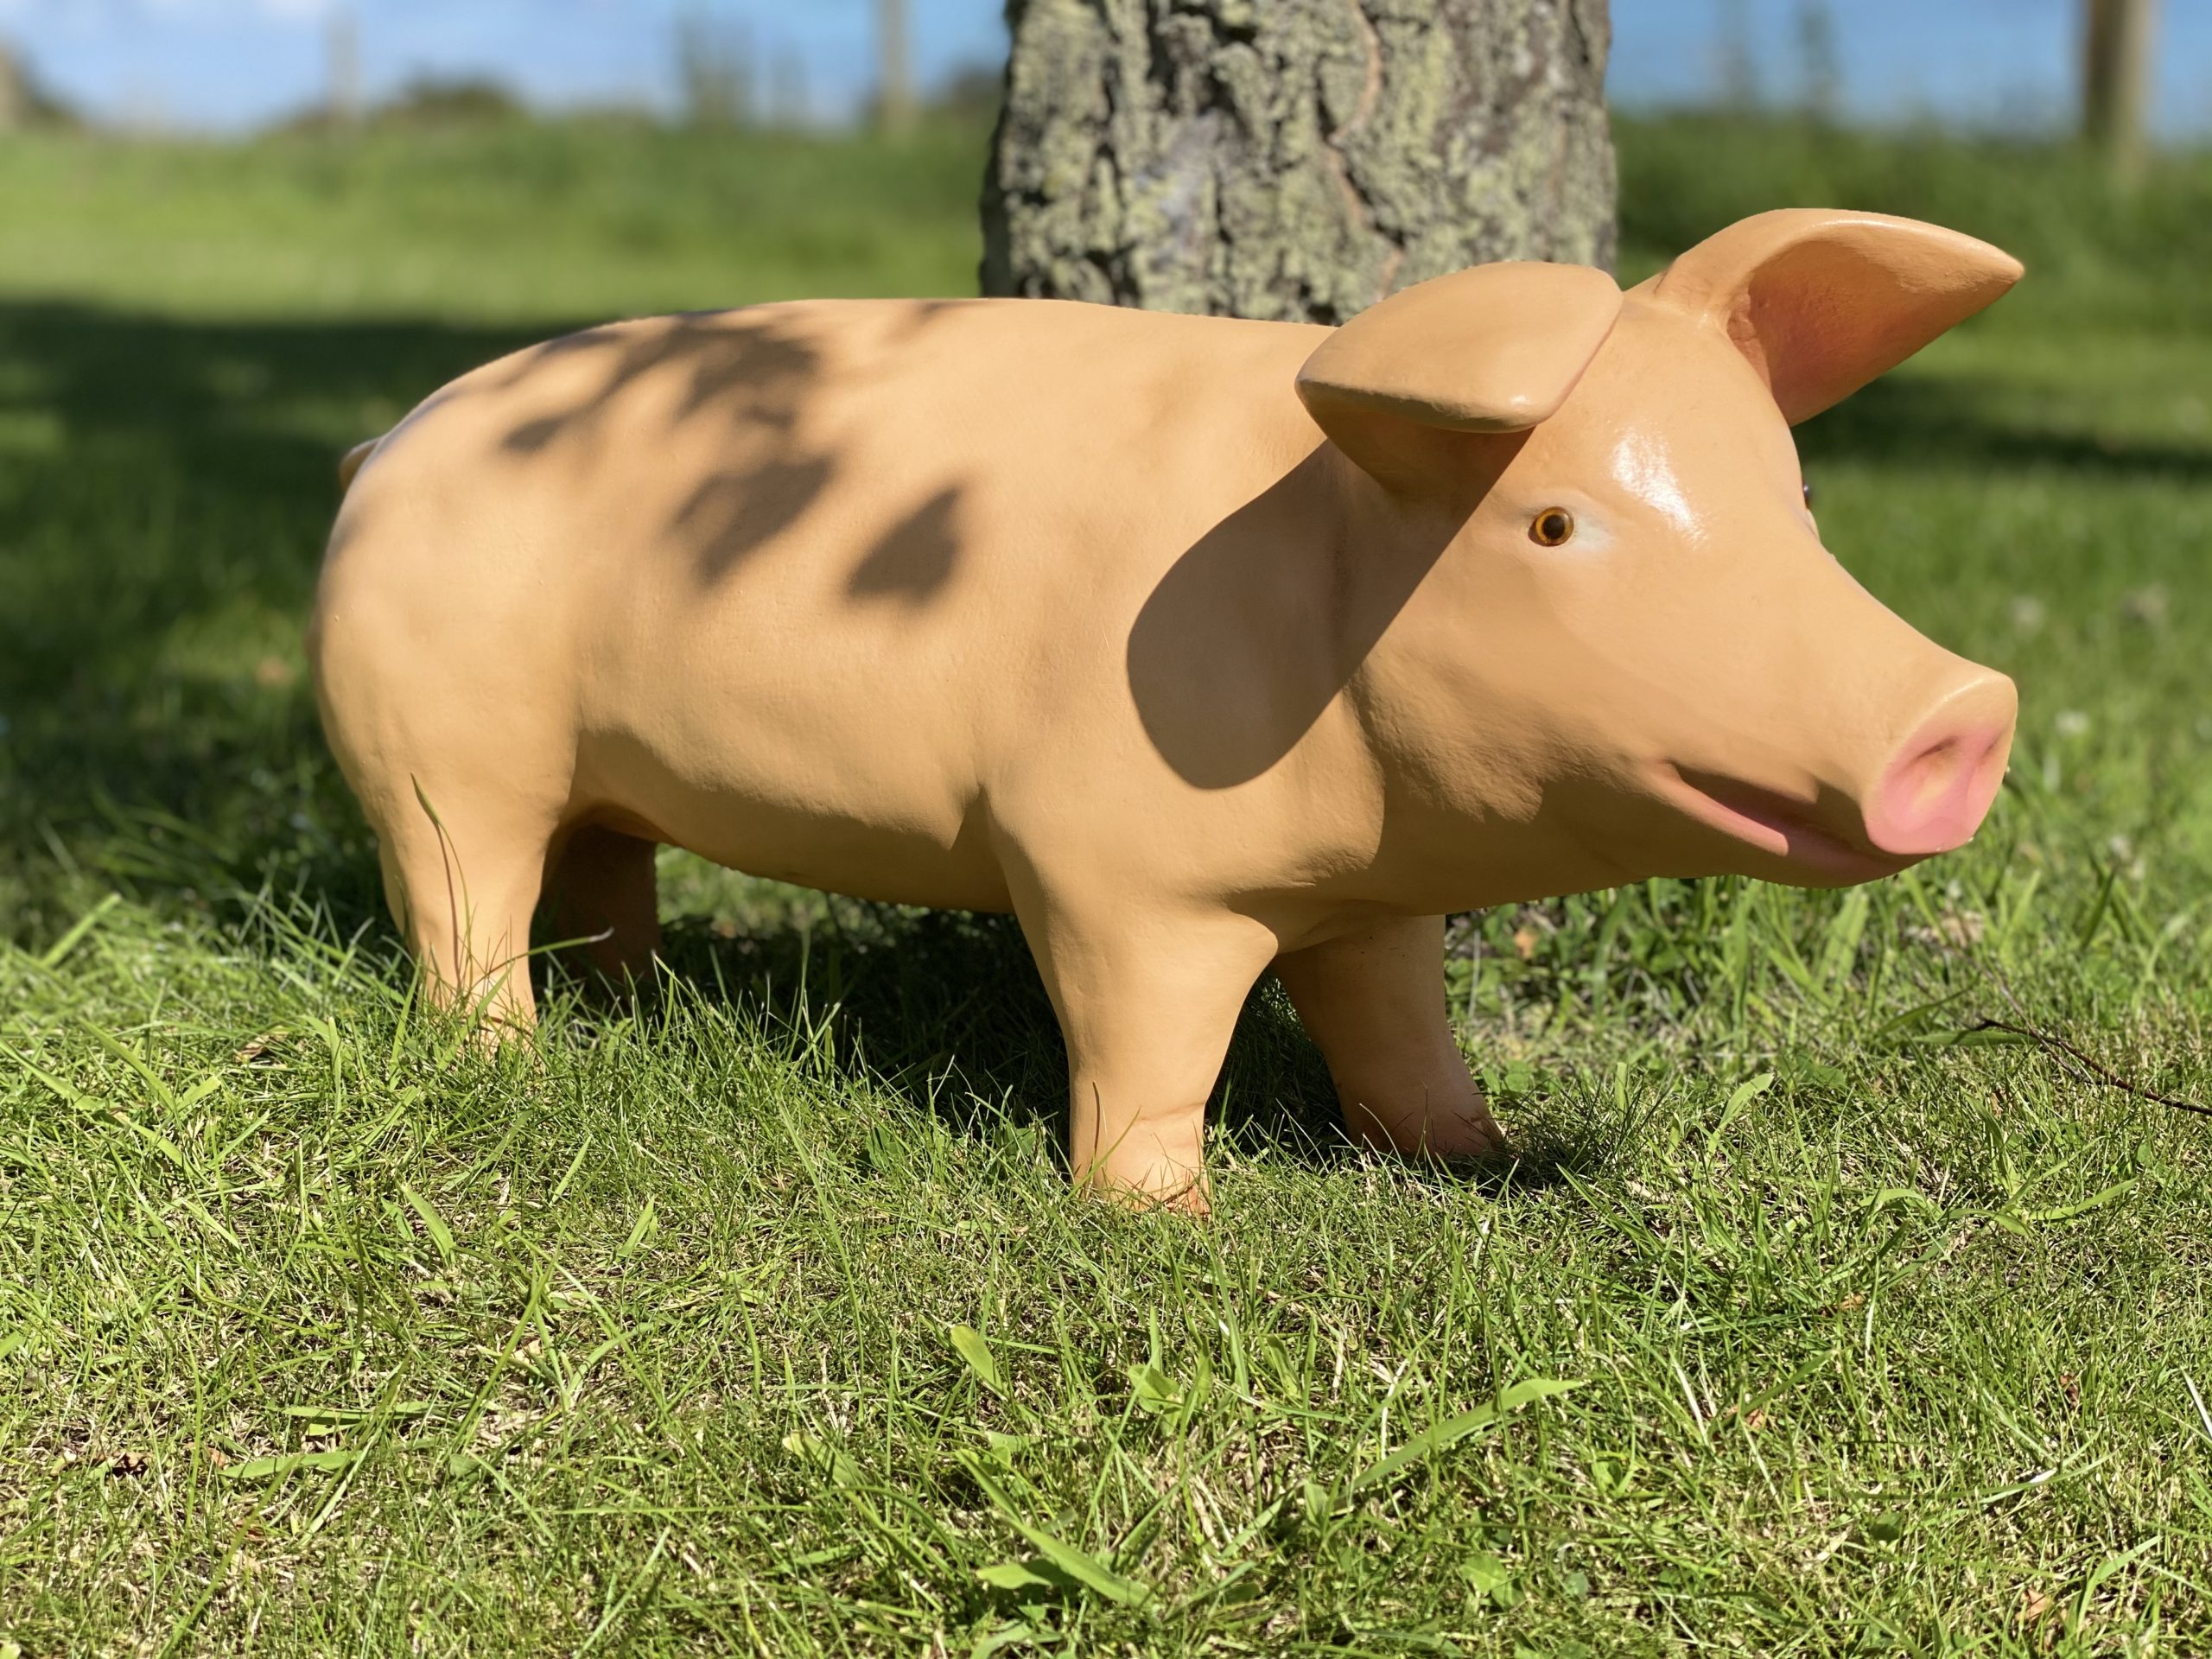 Life Size 3D Fibreglass Piglet Model hiding in the shadows